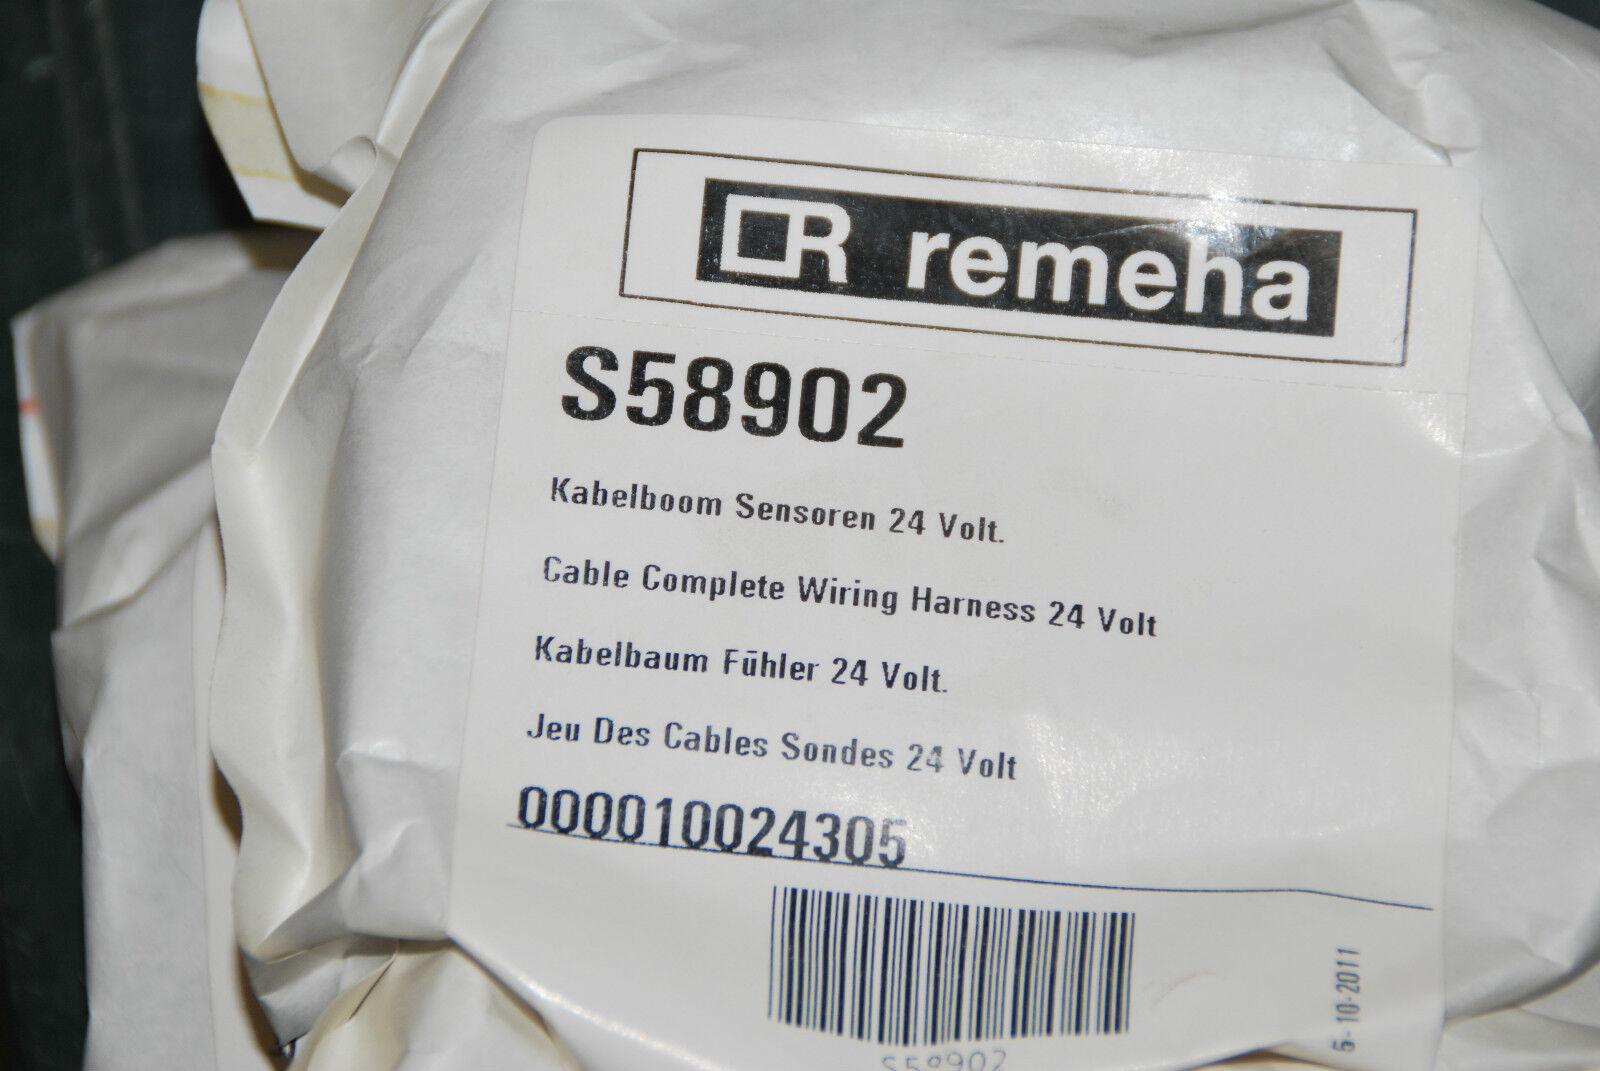 REMEHA S58902 KABELBAUM FÜHLER 24 V QUINTA 28 C KABELBOOM SENSOREN NEU